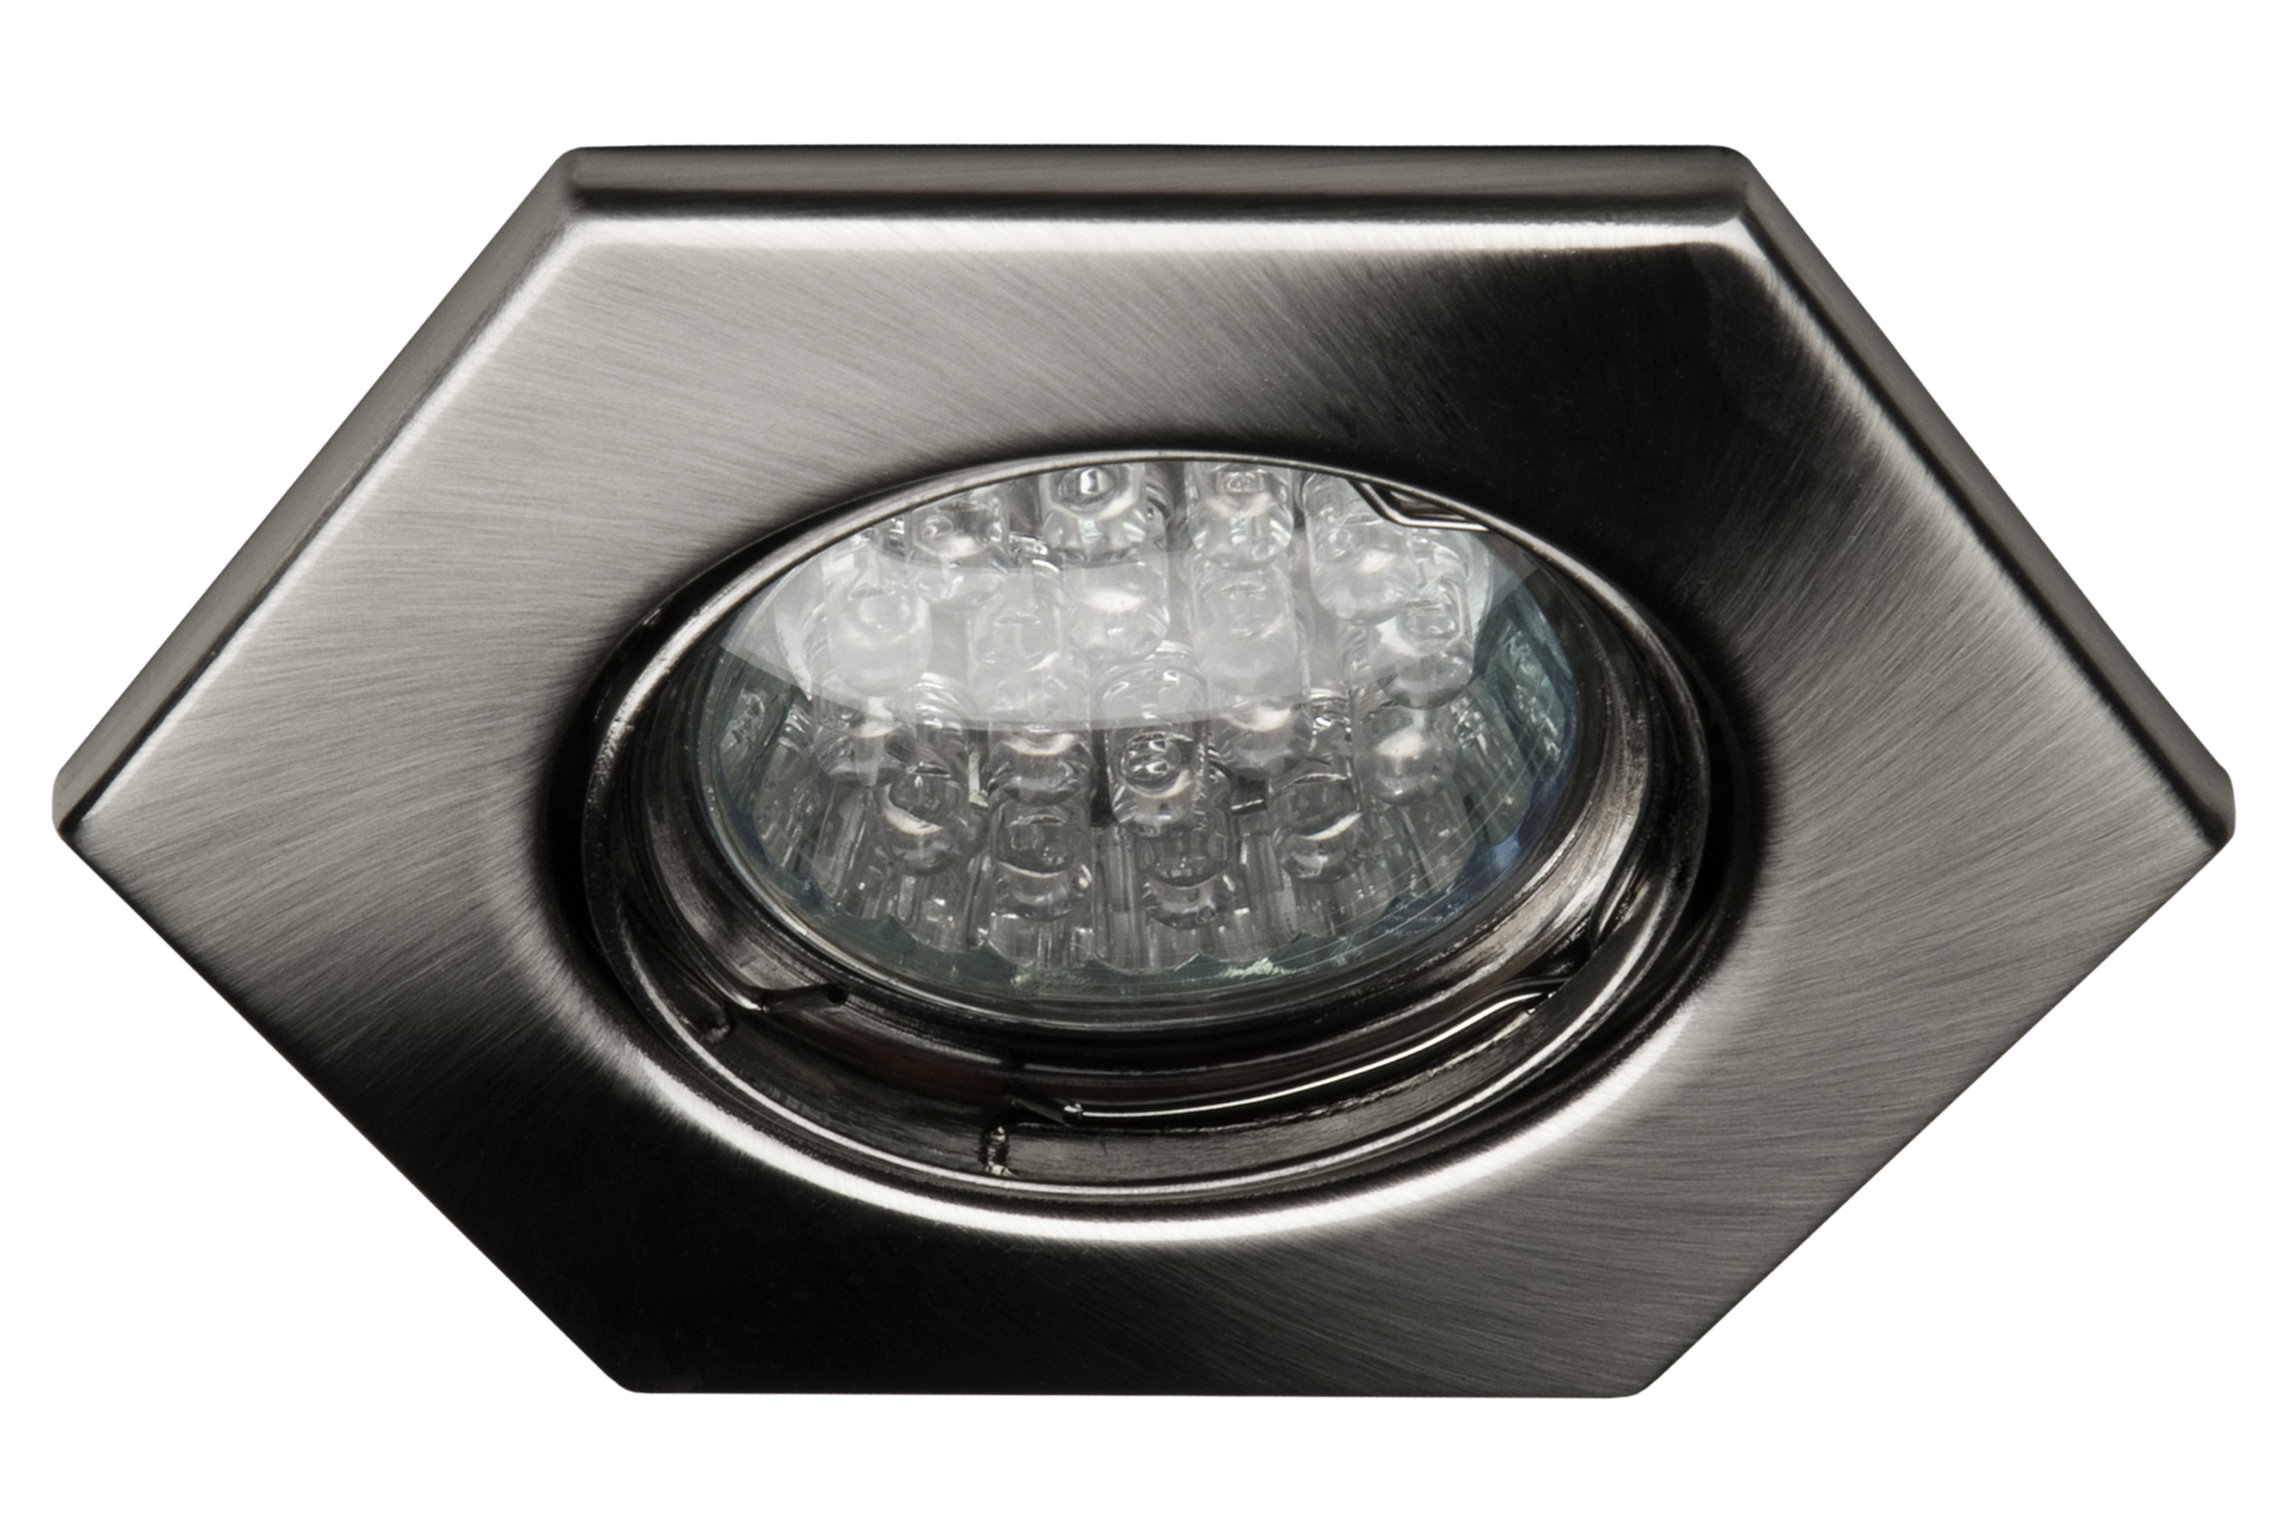 12 v led einbau strahler deckenleuchten strahler leuchte lampen spot einbauspots ebay. Black Bedroom Furniture Sets. Home Design Ideas